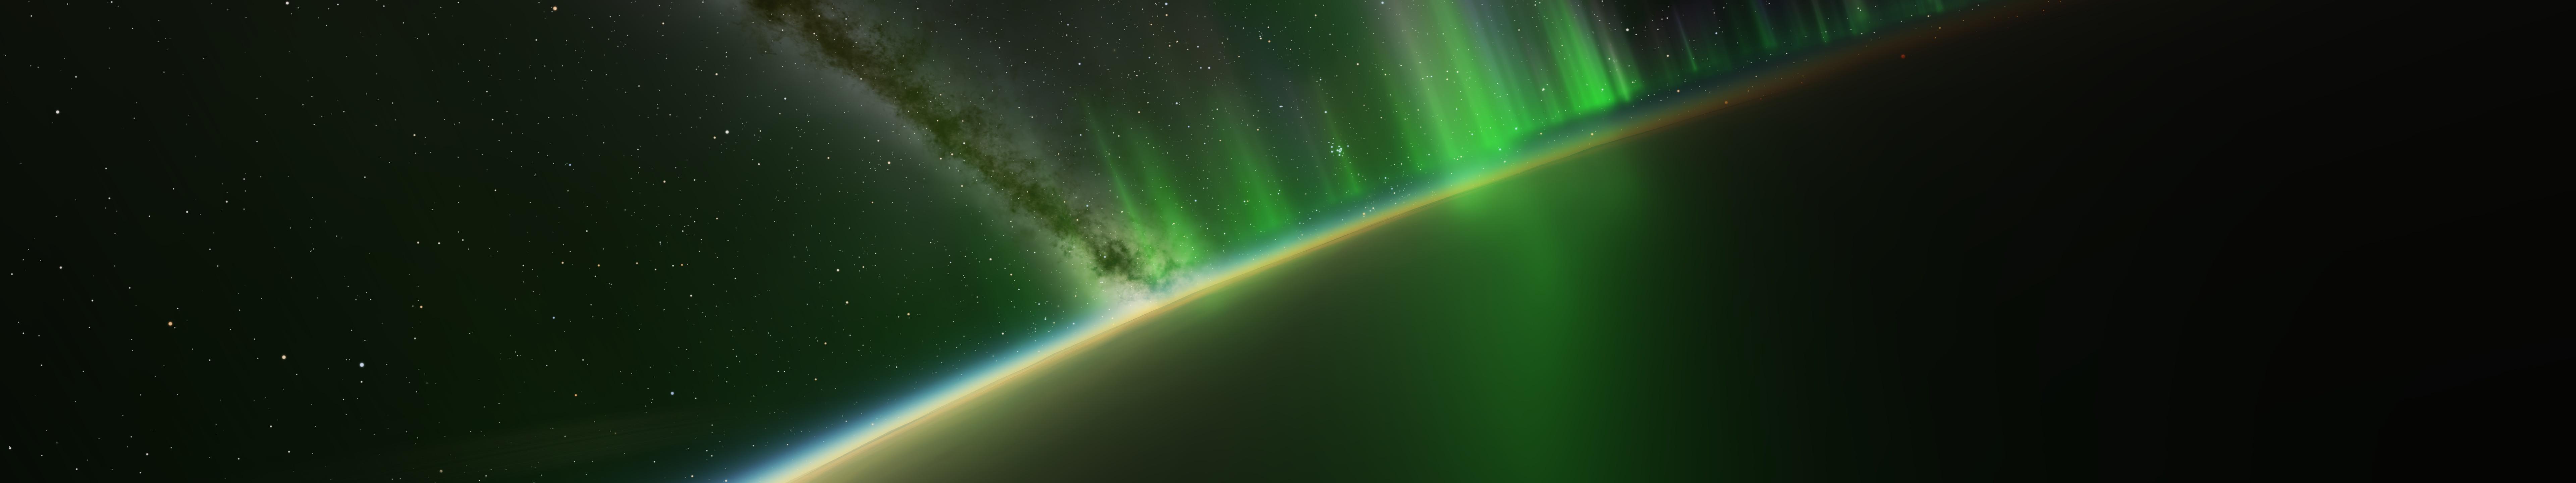 Wallpaper : 7680x1440 px, planet, space